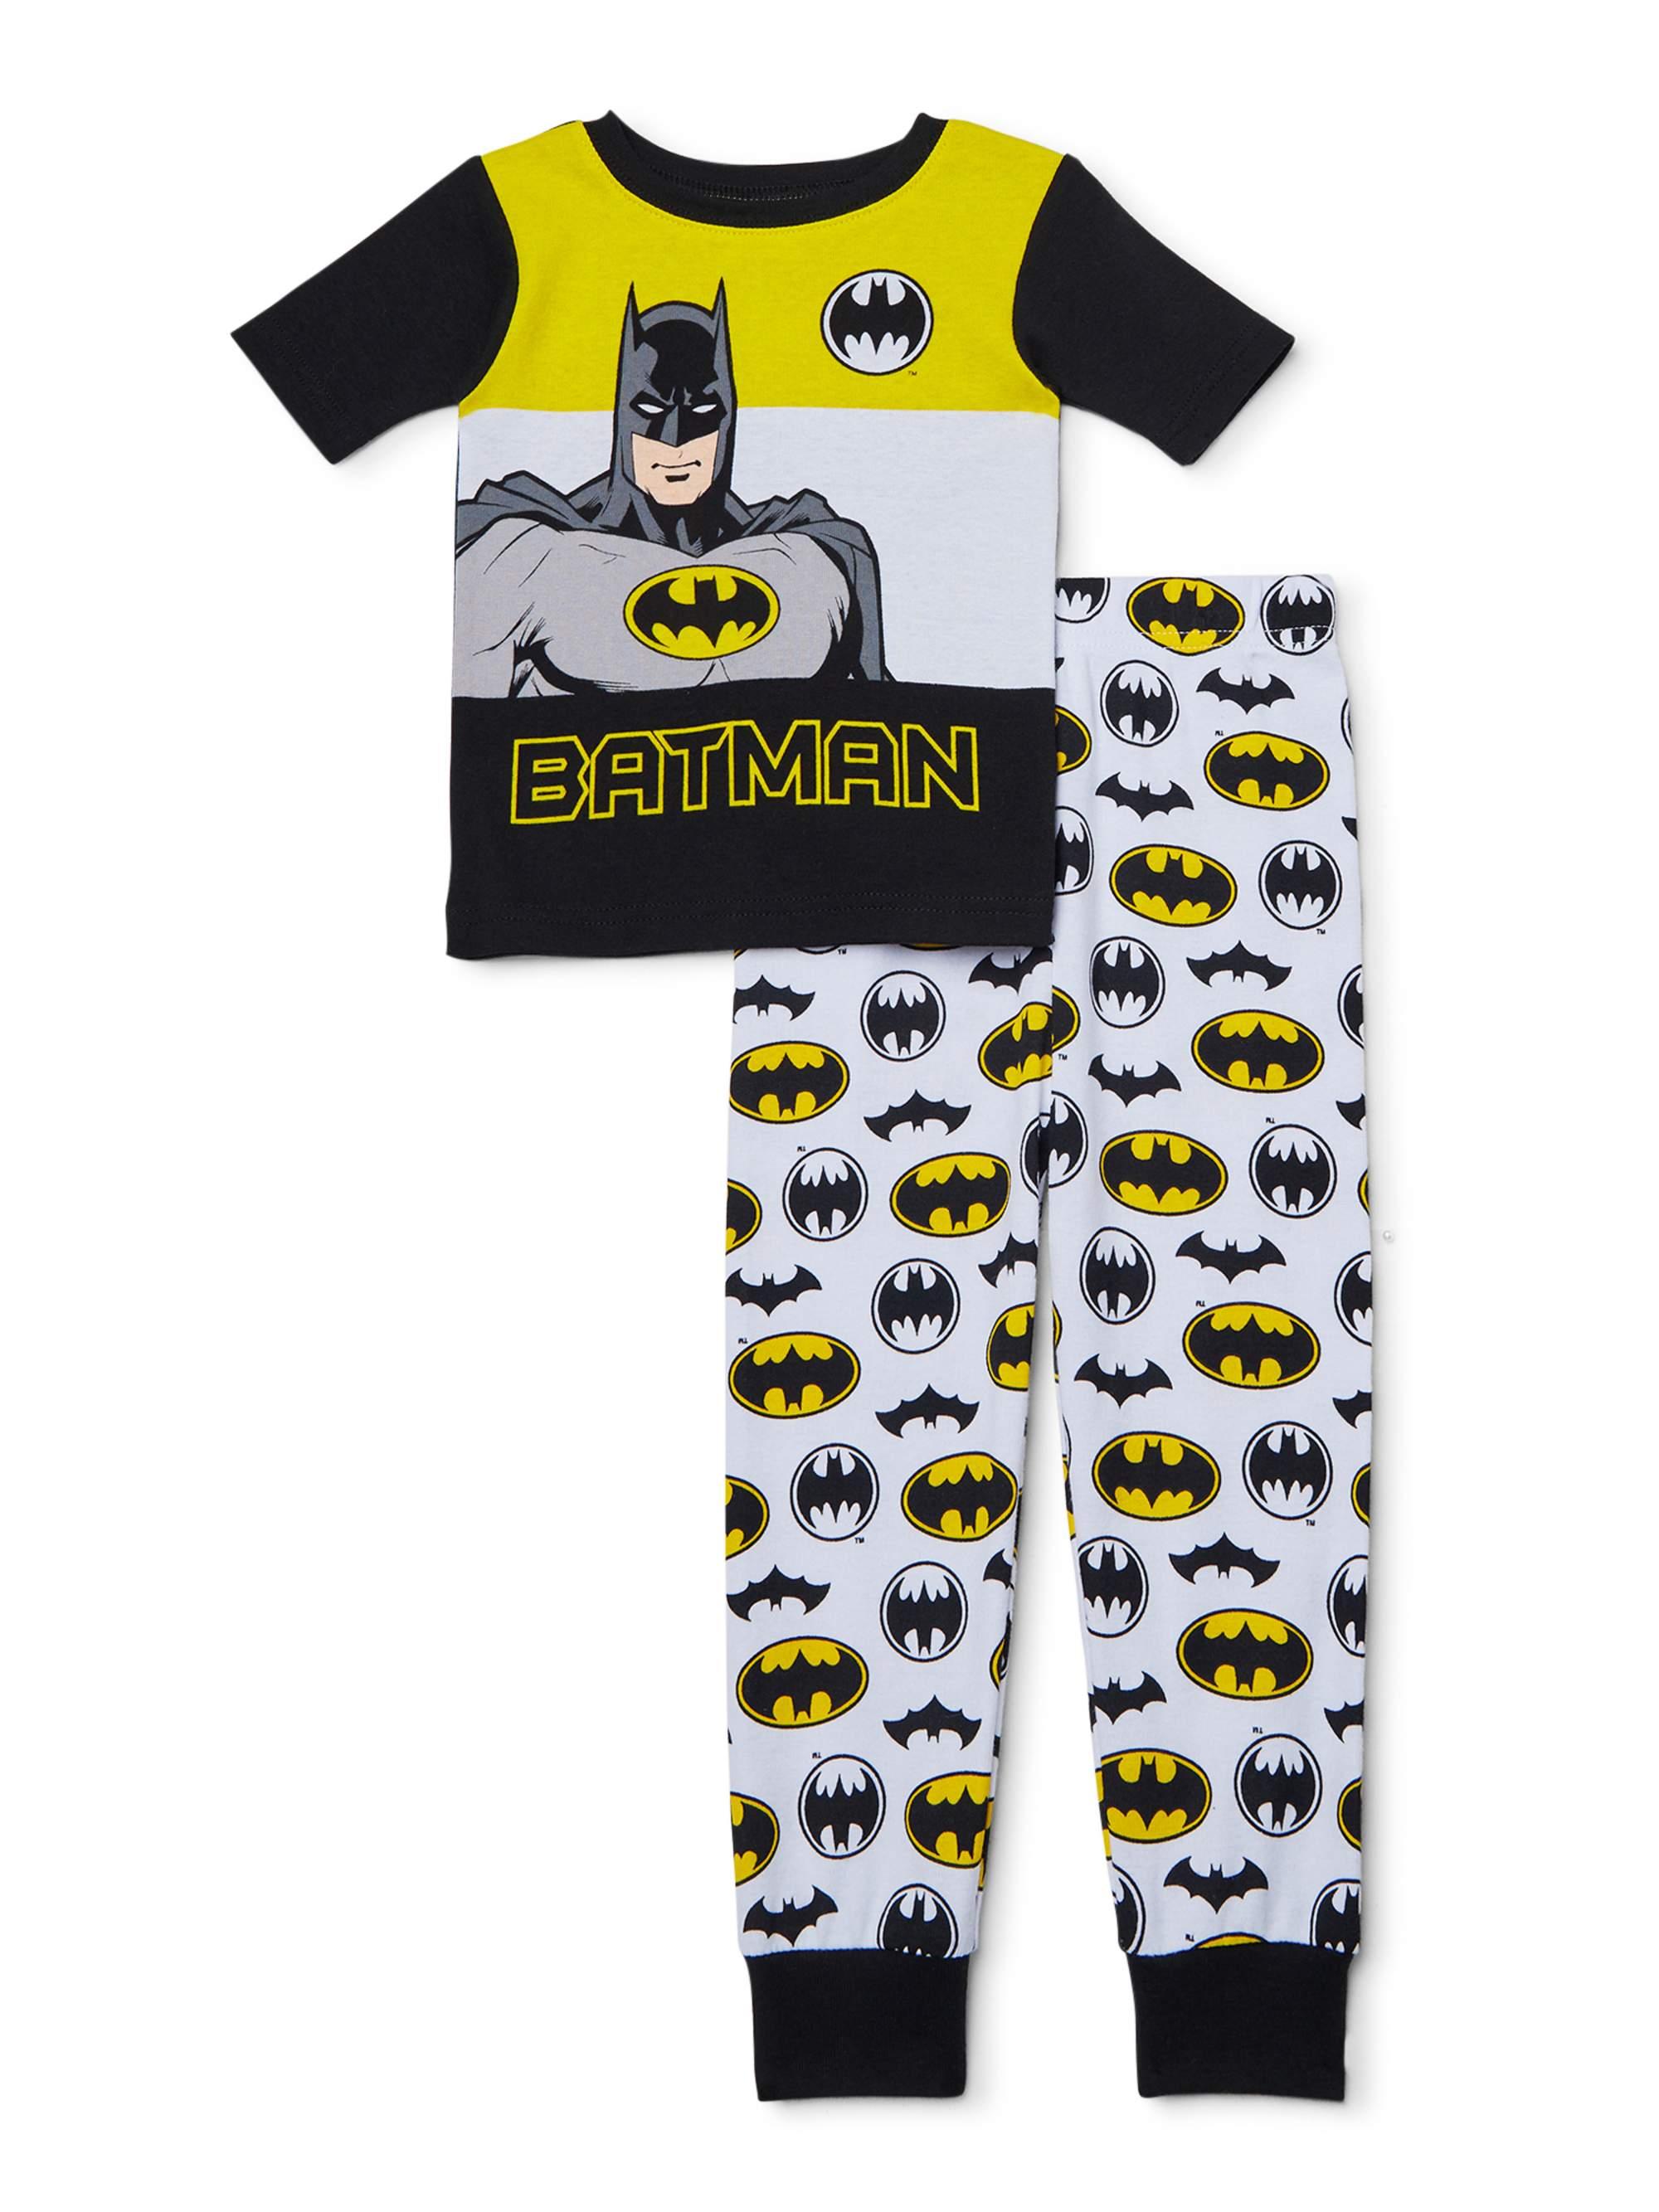 BATMAN DC Basic Fleece Pajamas Sleepwear Set NWT Toddler/'s Size 2T 4T or 5T 3T